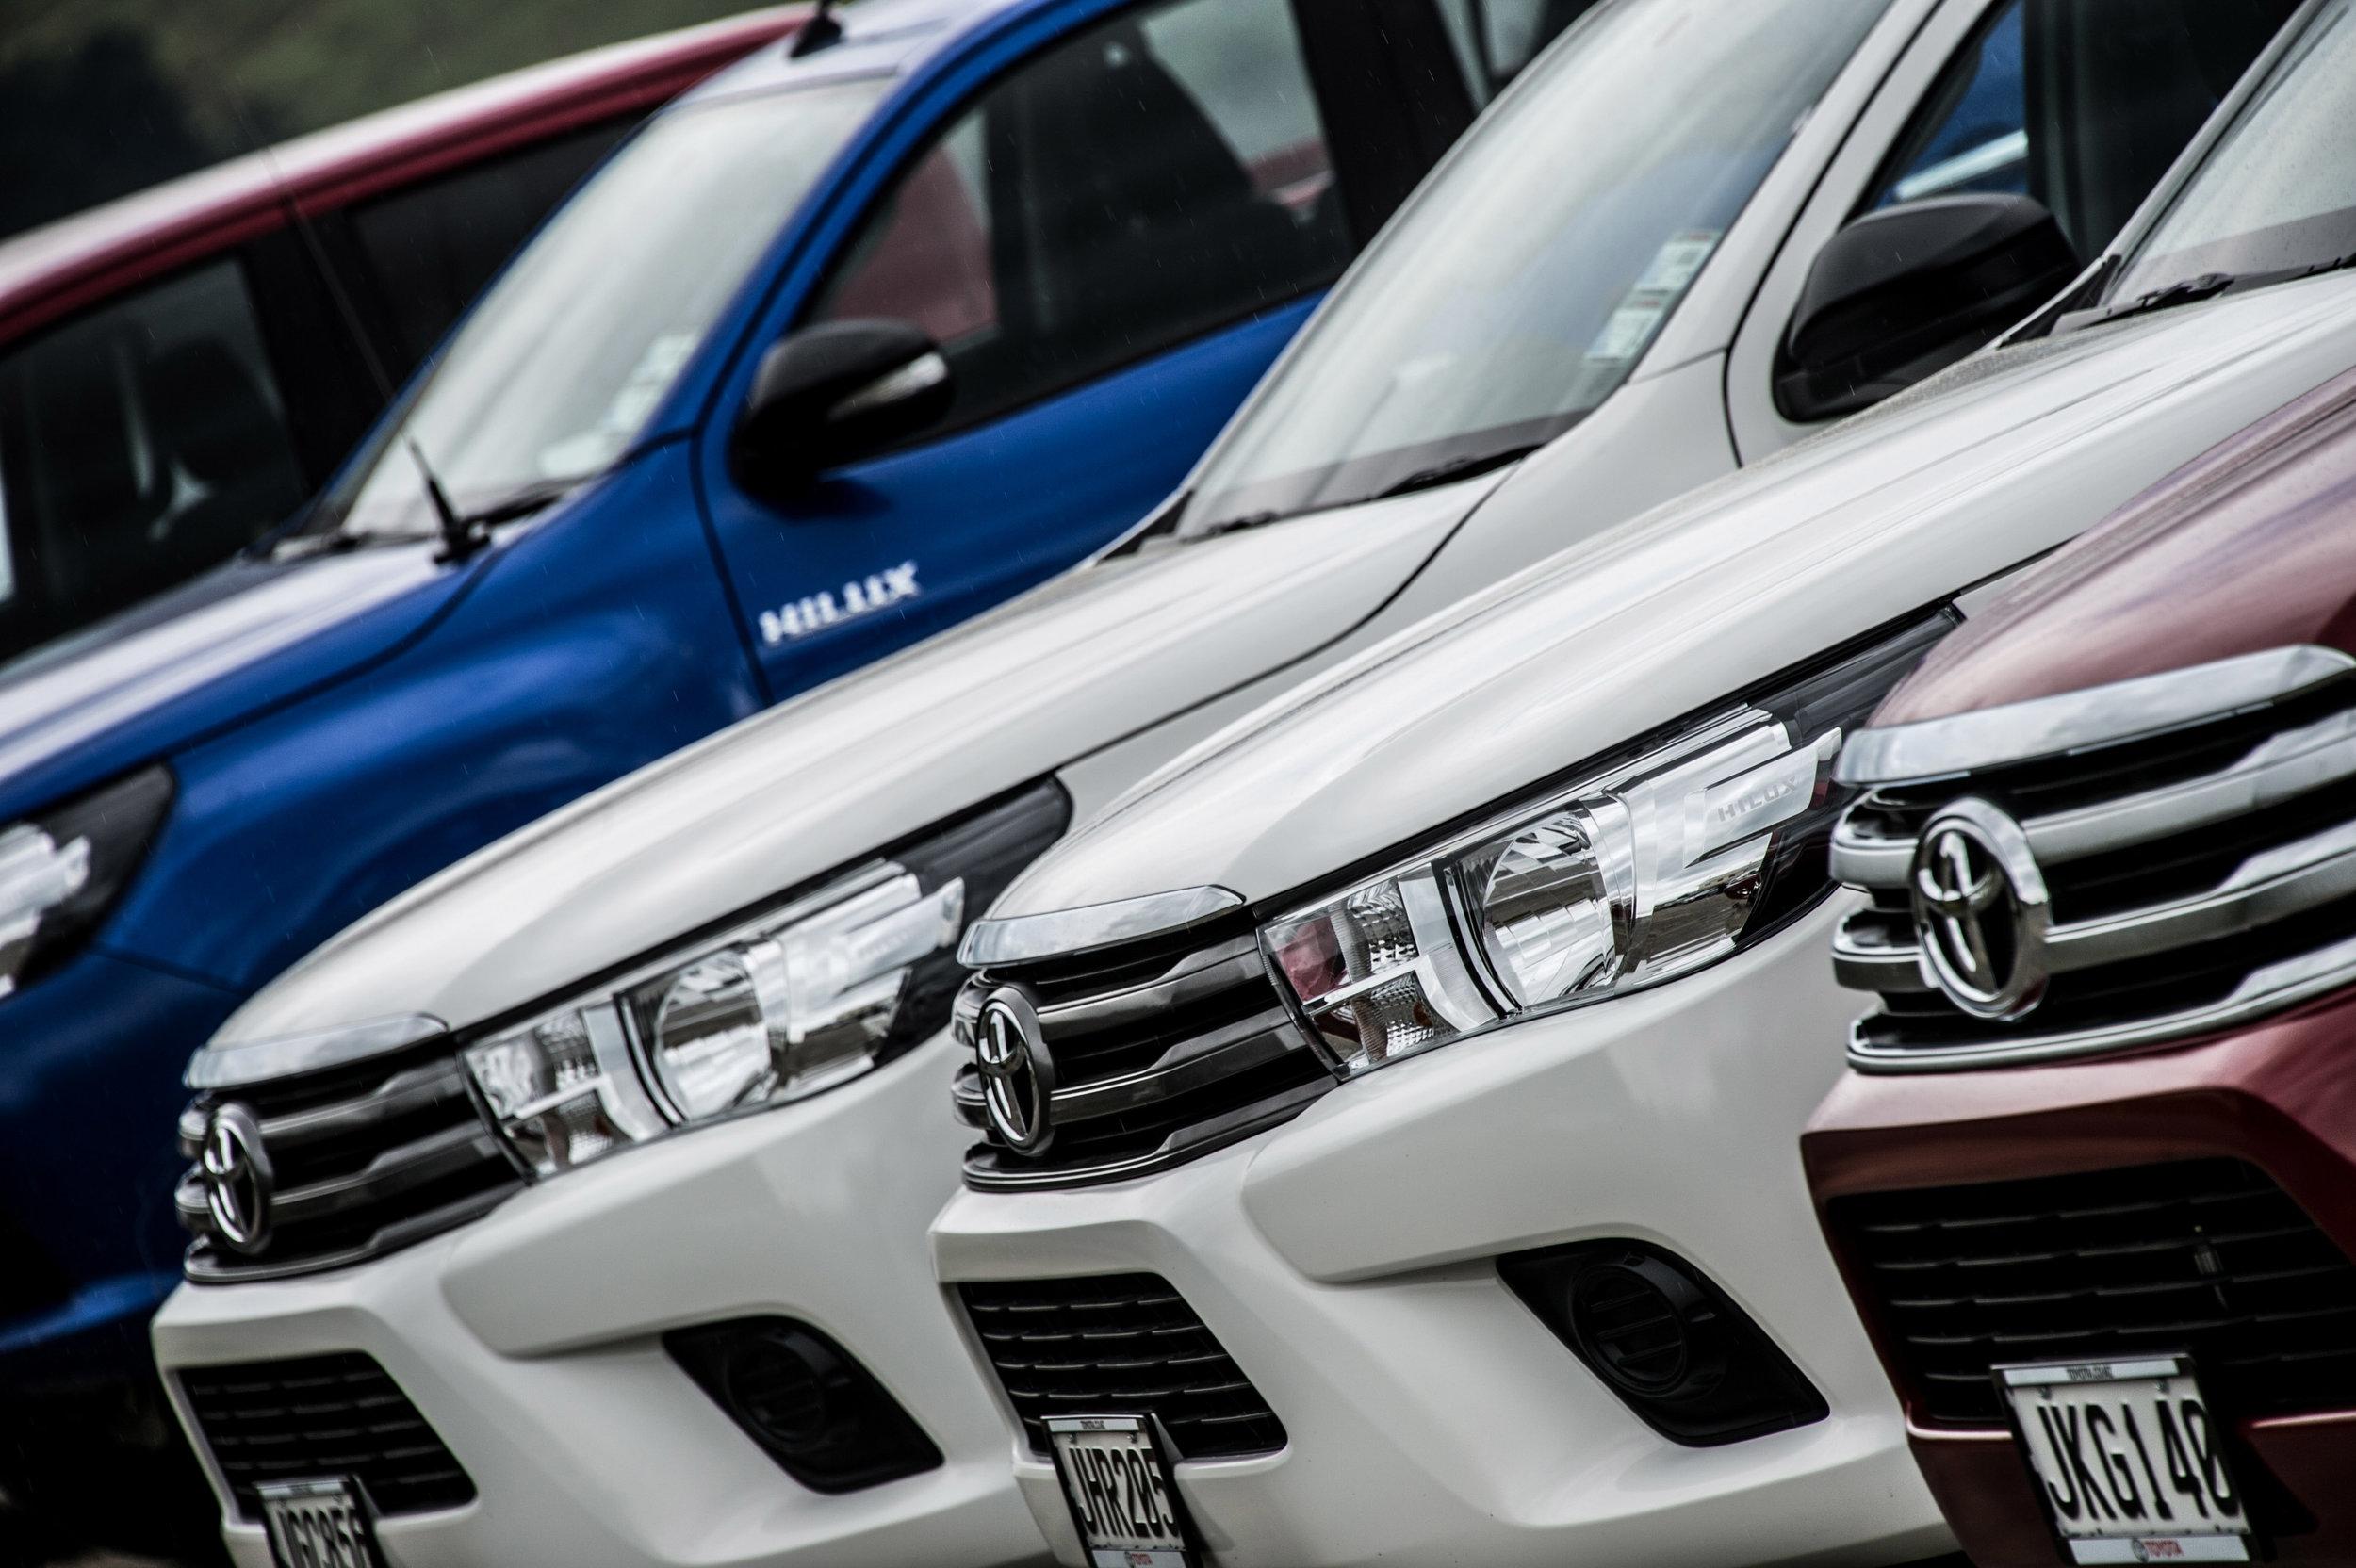 Image- Toyota line up.jpg